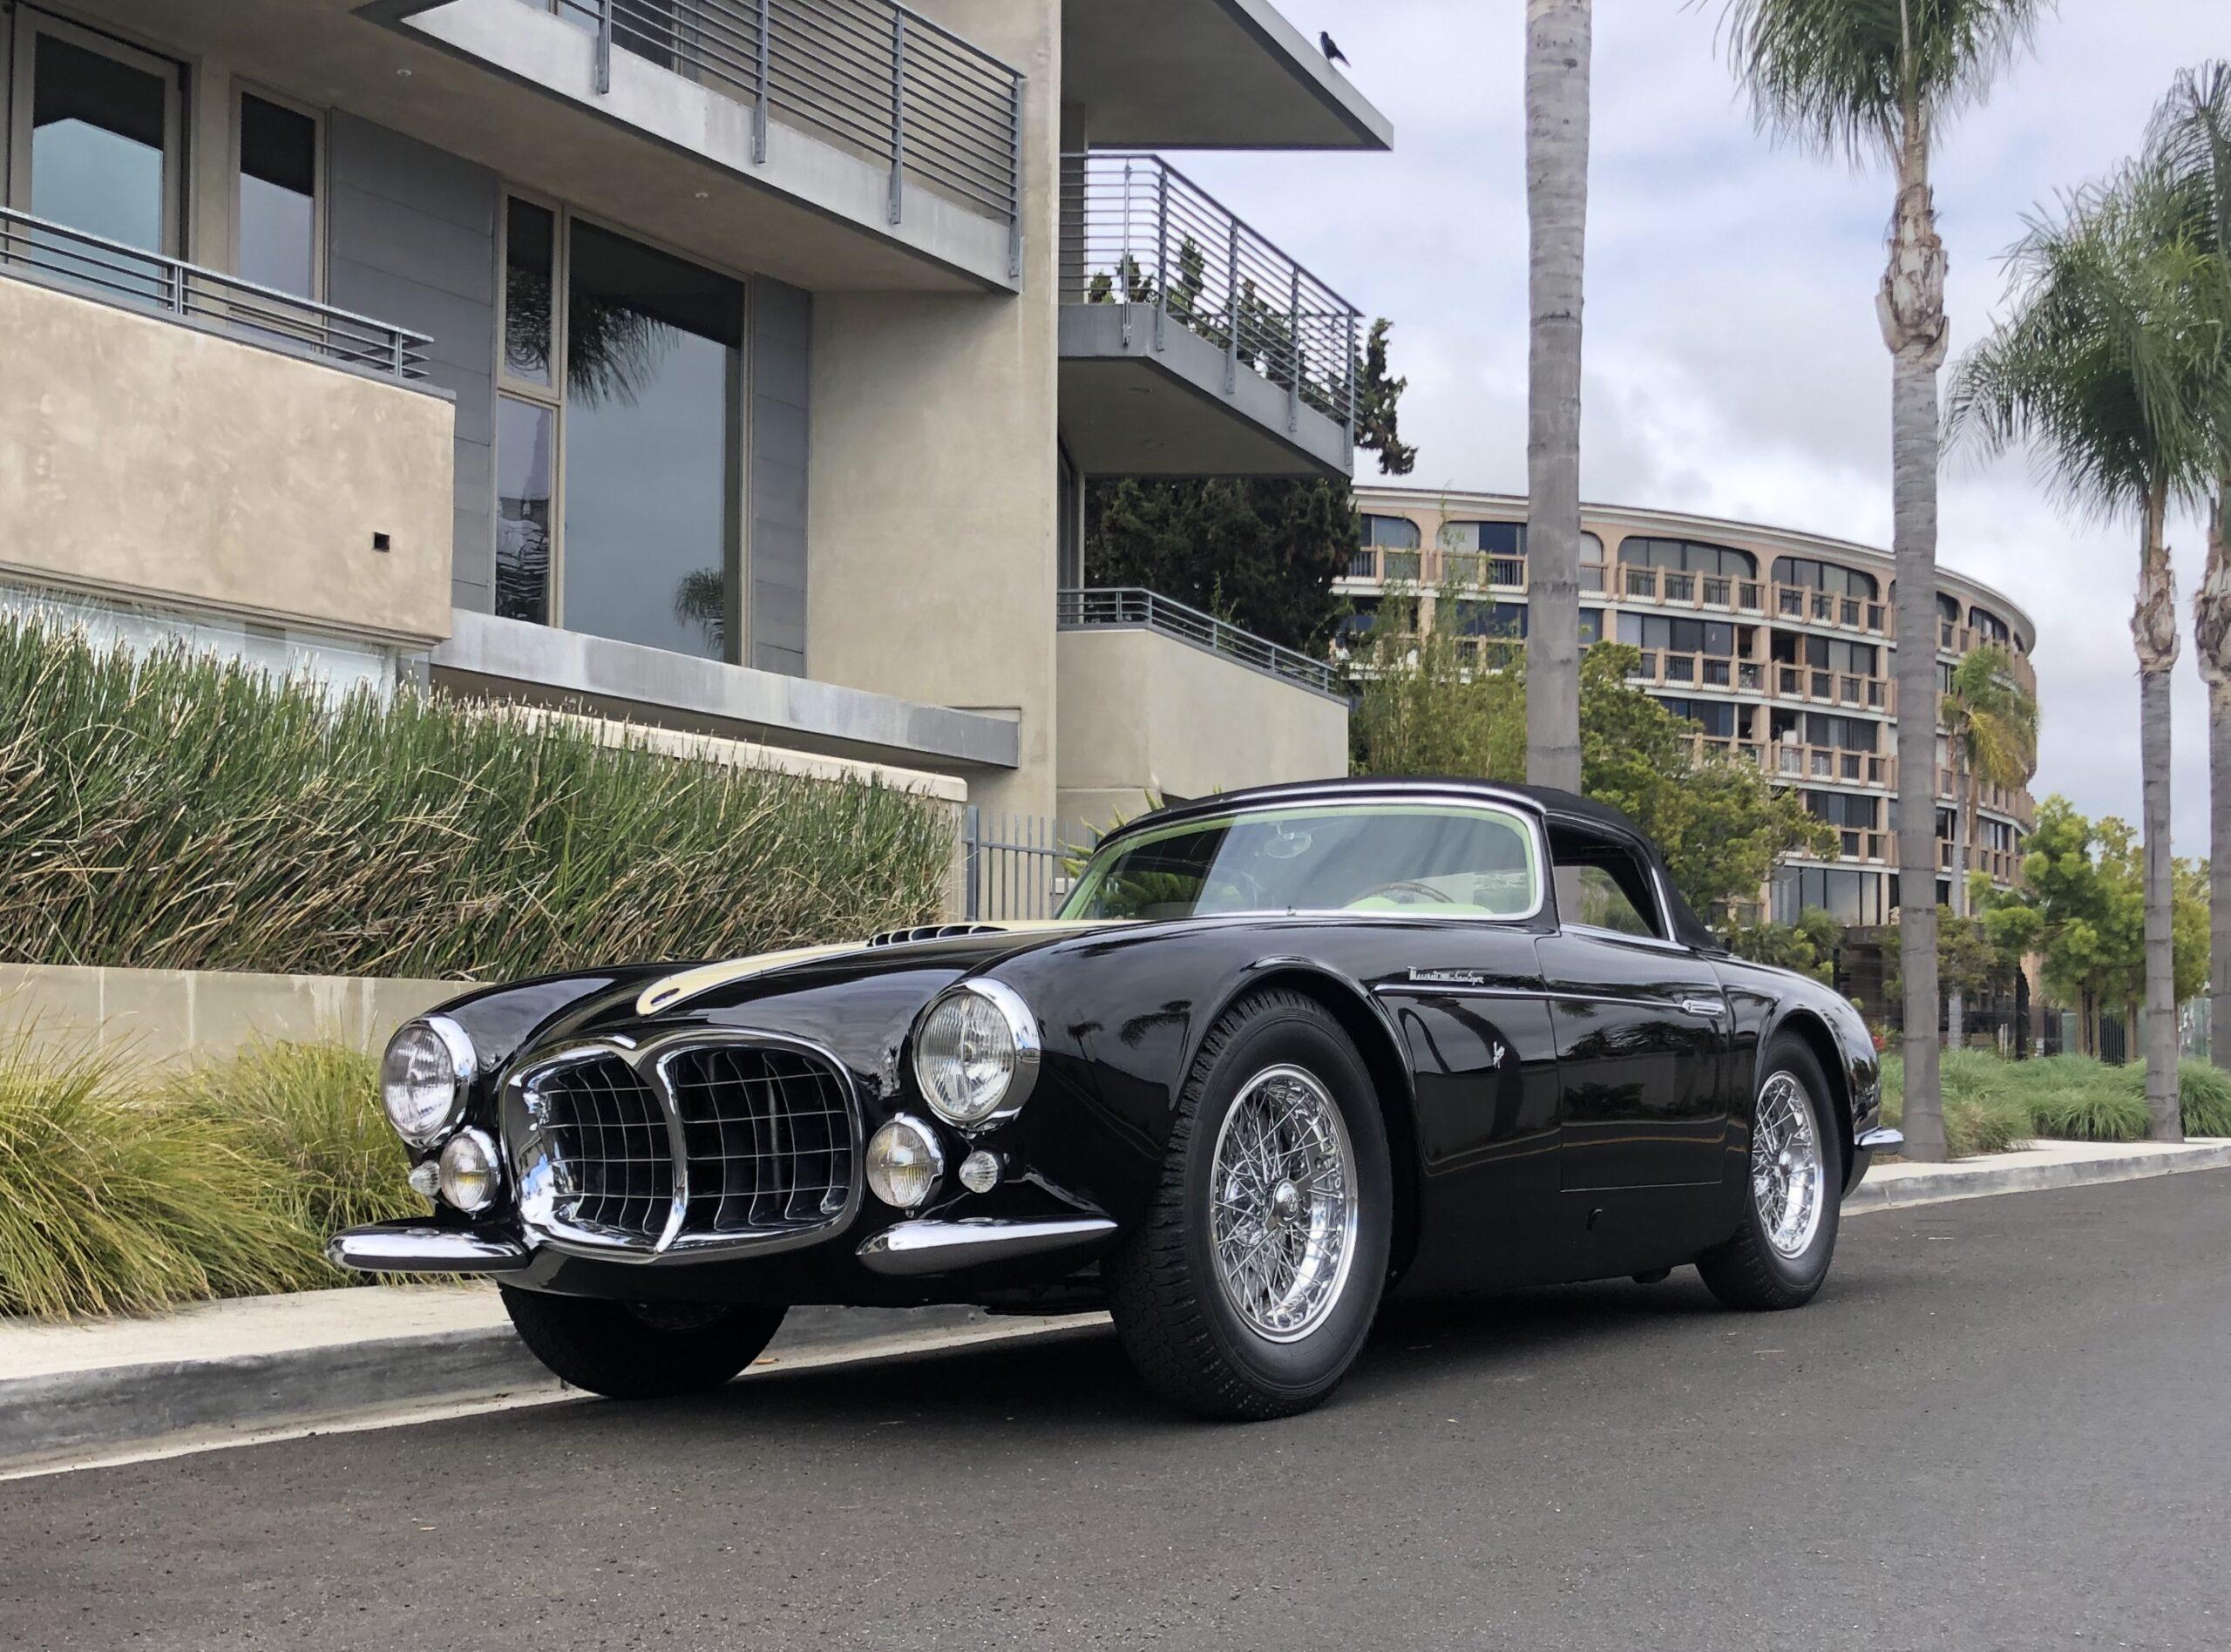 Maserati – A6GCS 53 Spyder